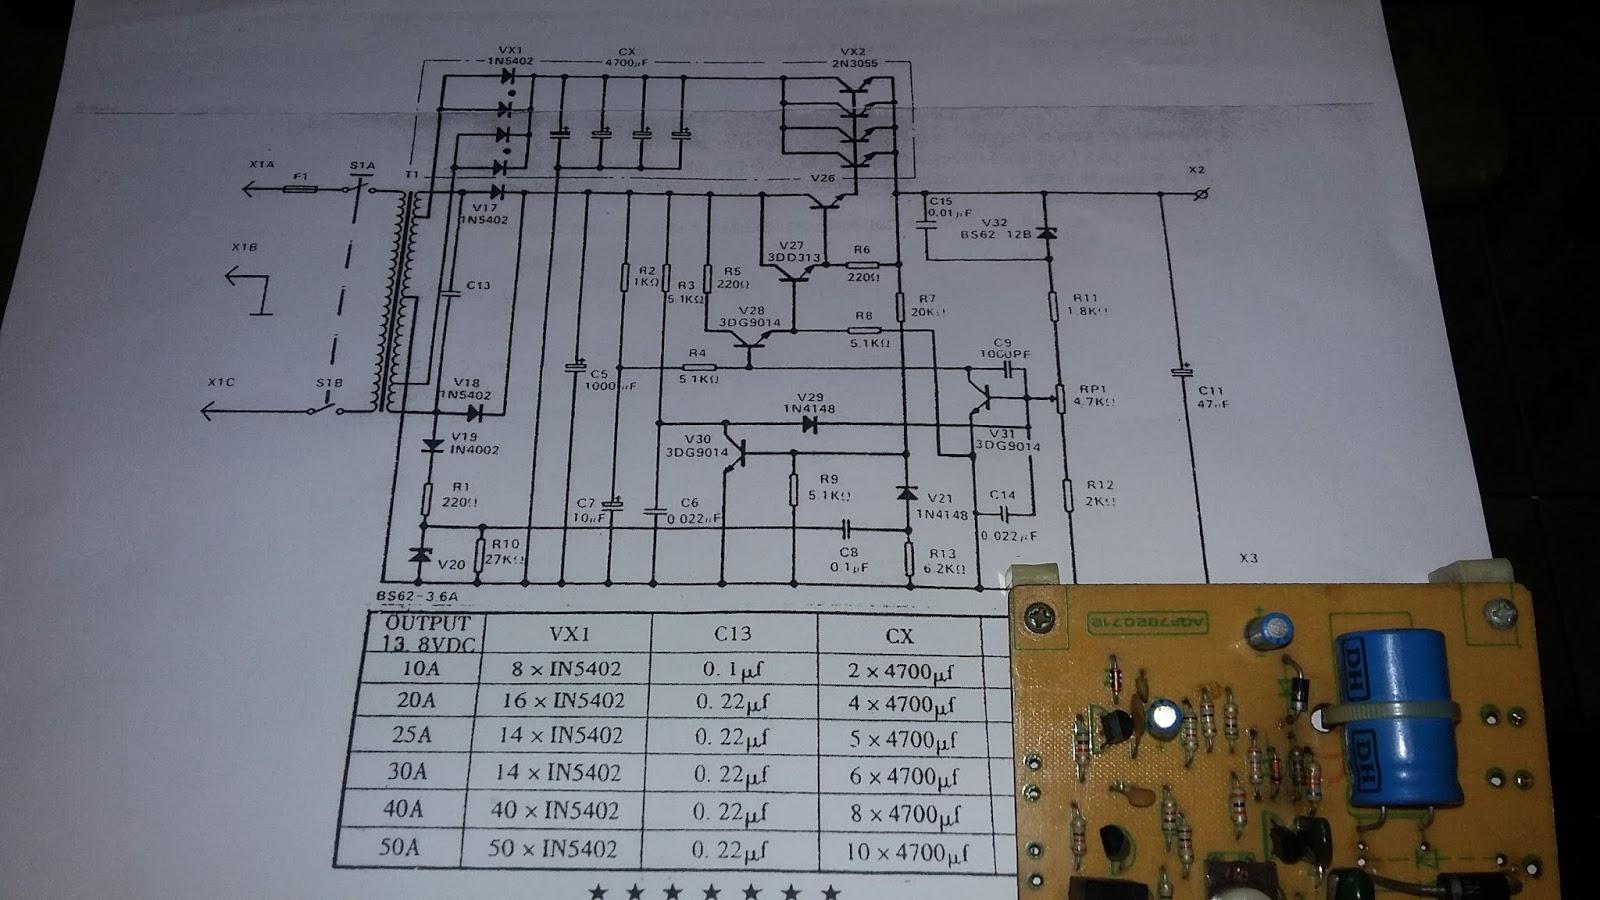 RadioaficionCR: Diagrama DVP 2212 Nippon